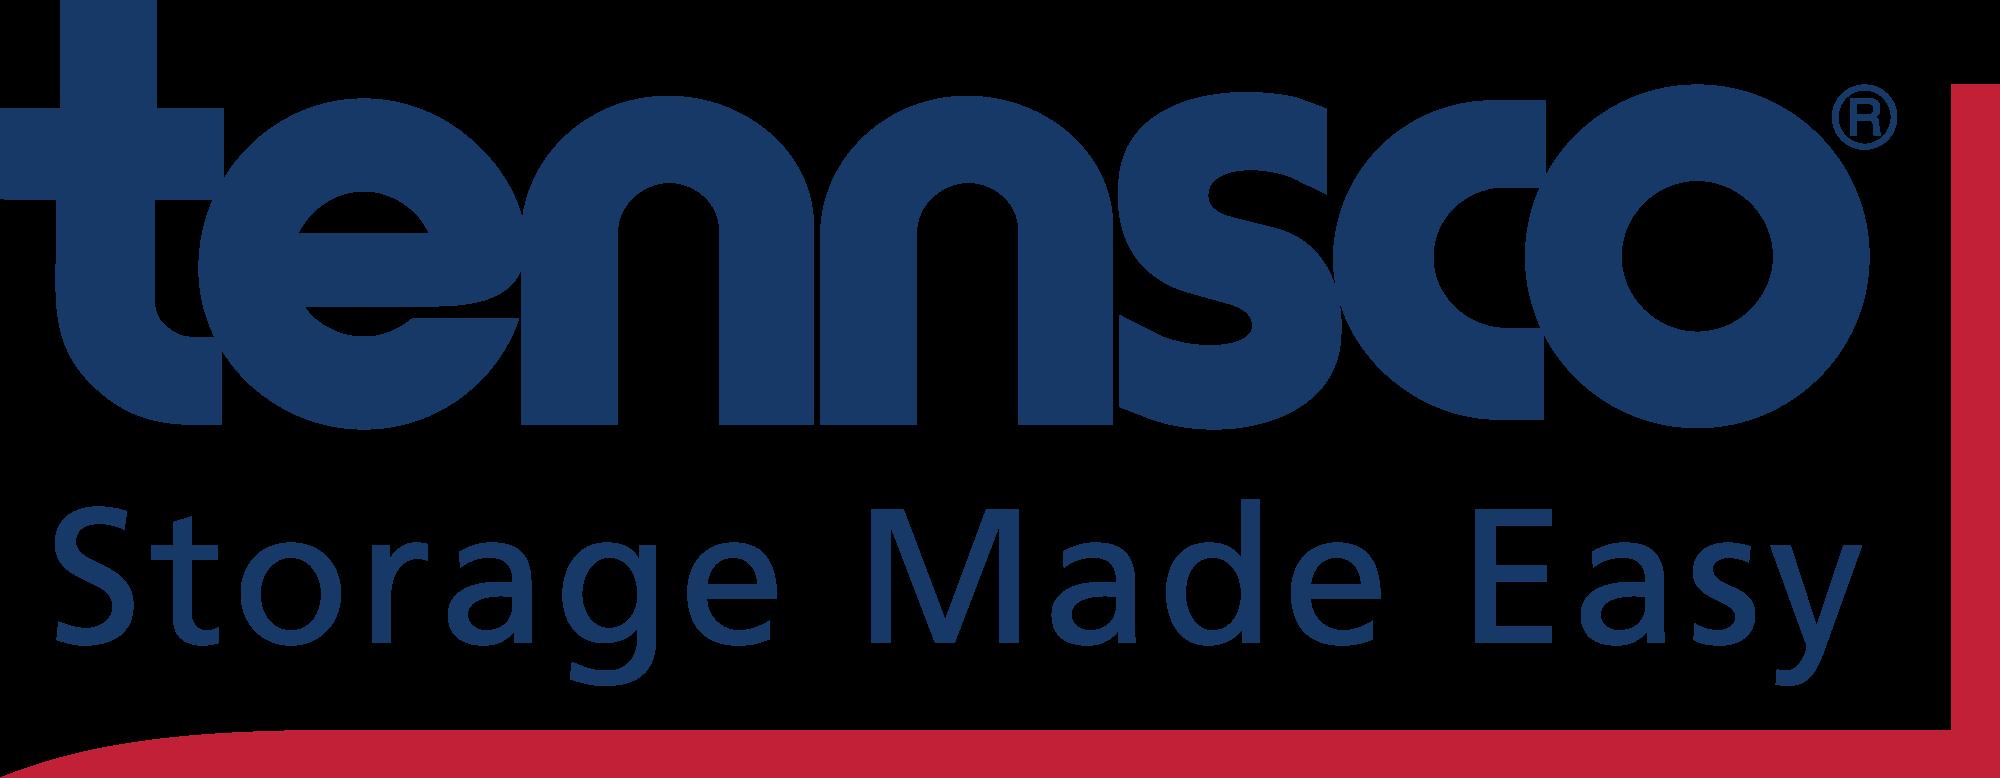 tennsco_logo.png